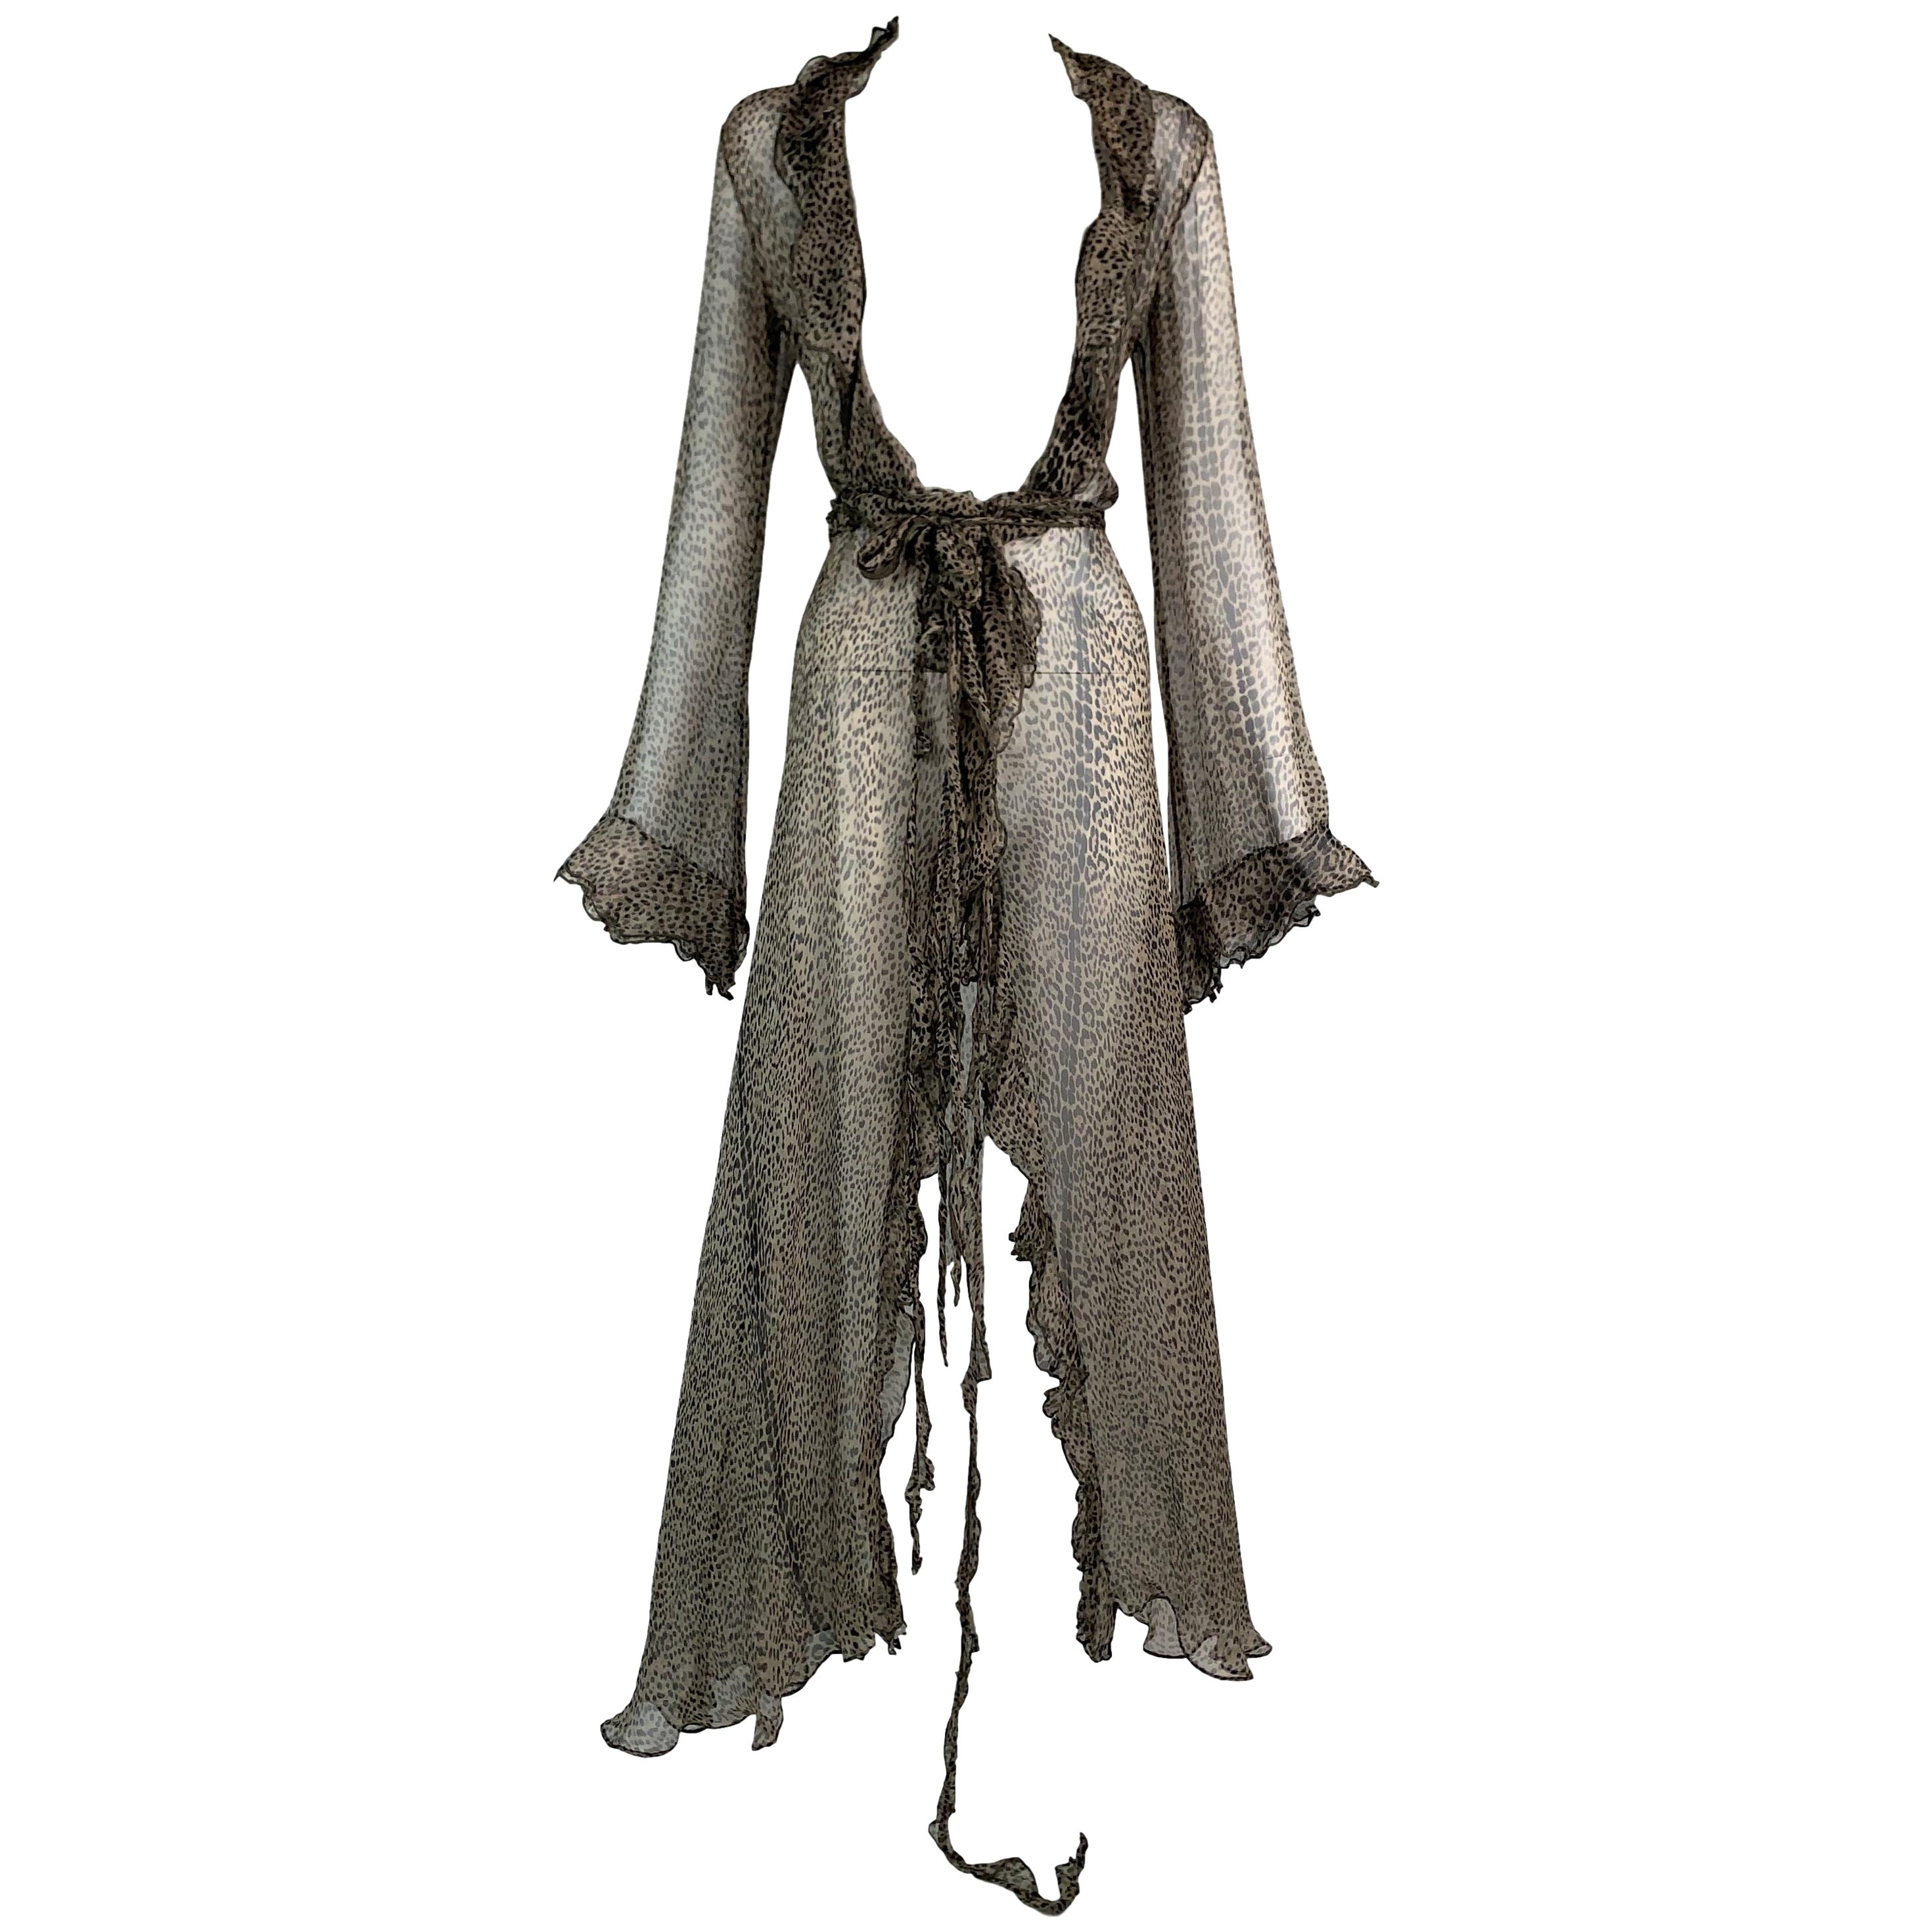 S/S 2002 Roberto Cavalli Runway Sheer Leopard Silk Wrap Maxi Dress